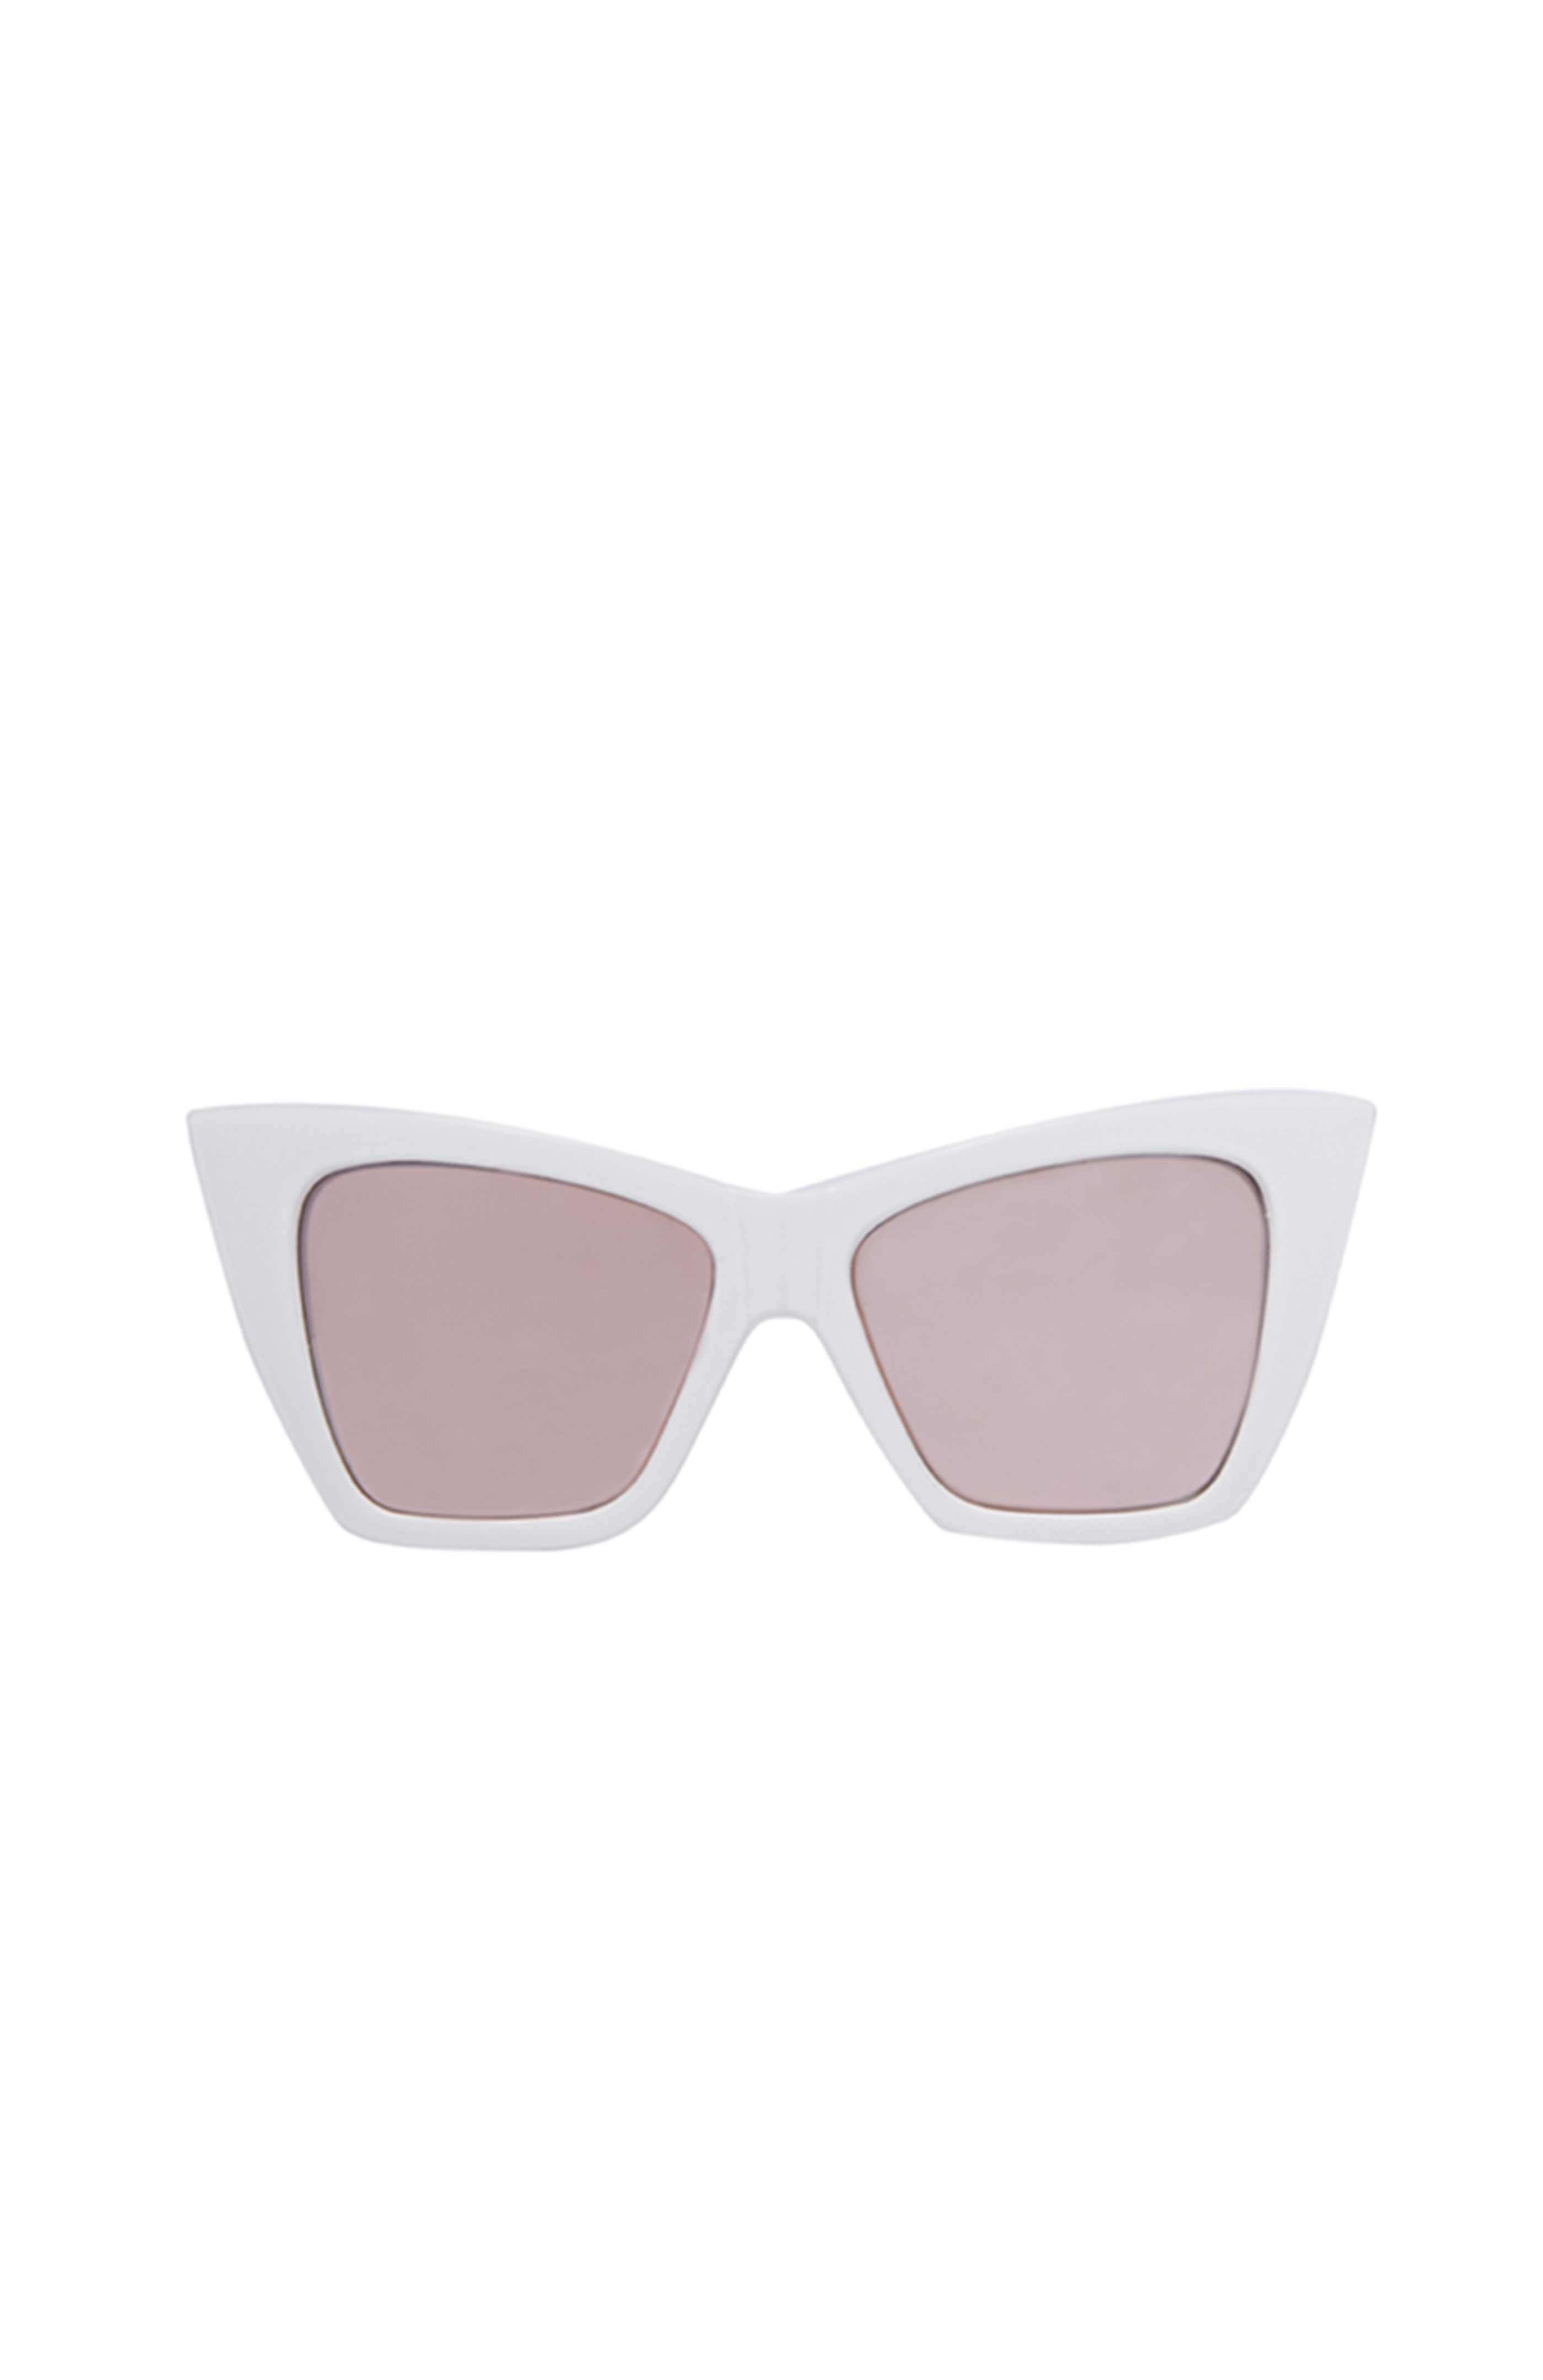 88fc9d08b5 Quay X Shay Mitchell Vesper Sunglasses in White